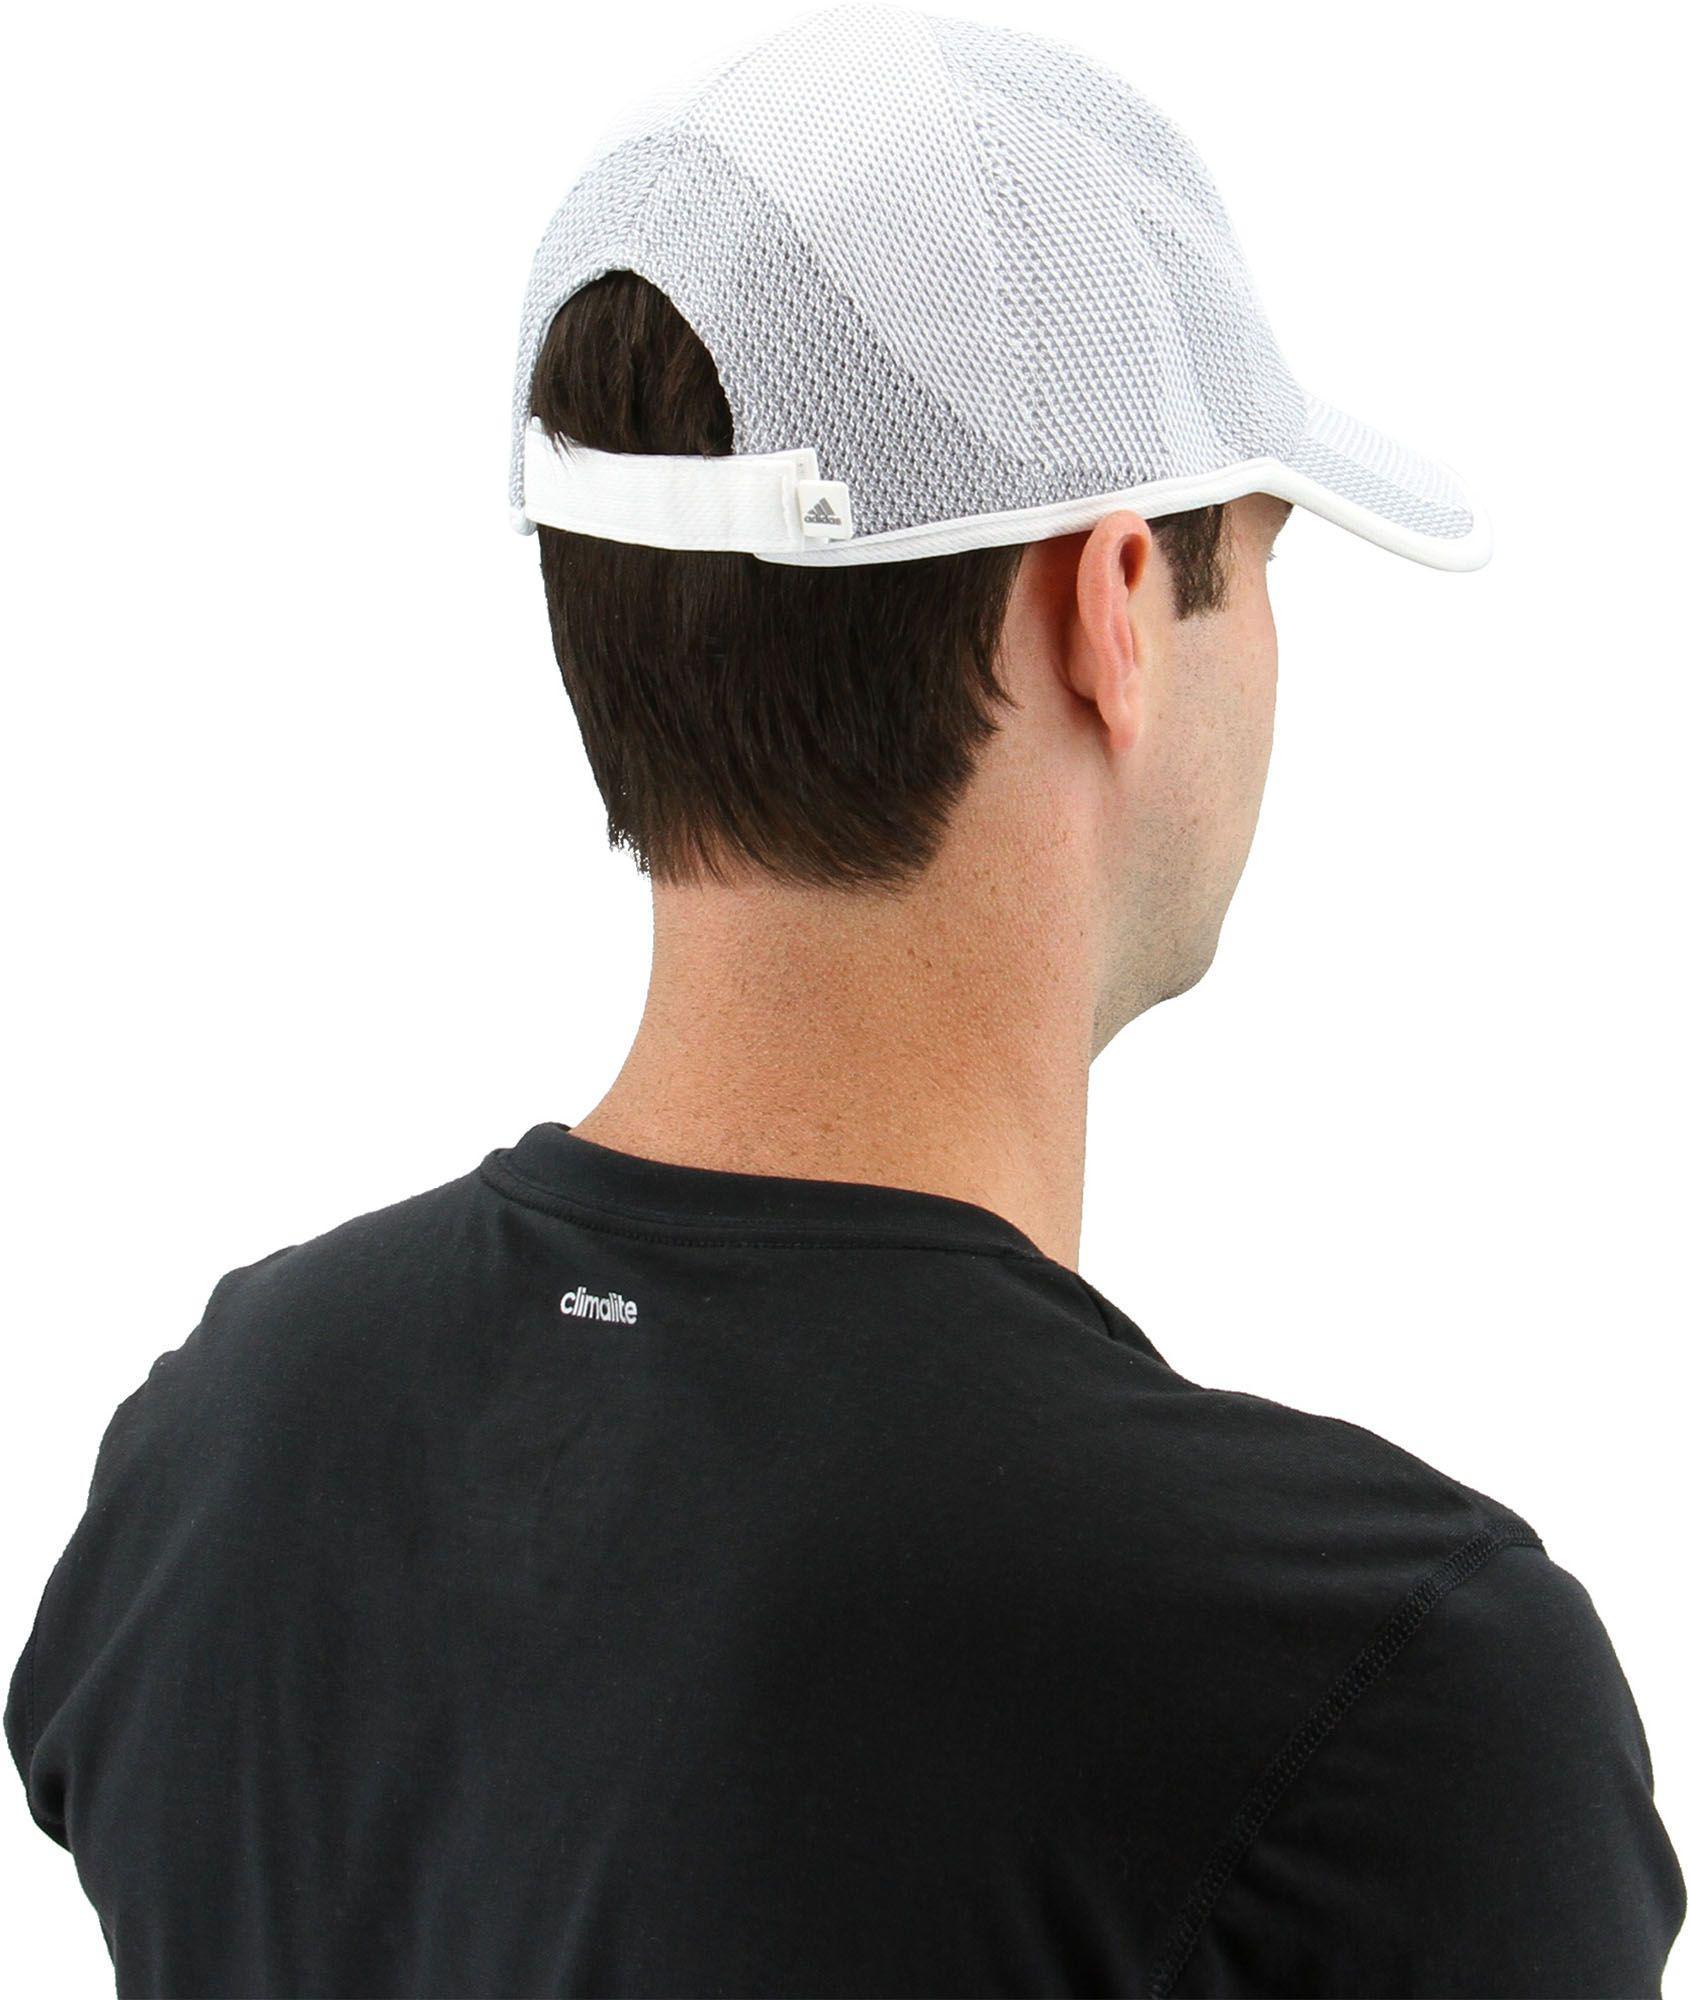 Lyst - adidas Superlite Prime Hat in White for Men 39ac4b3ccf6